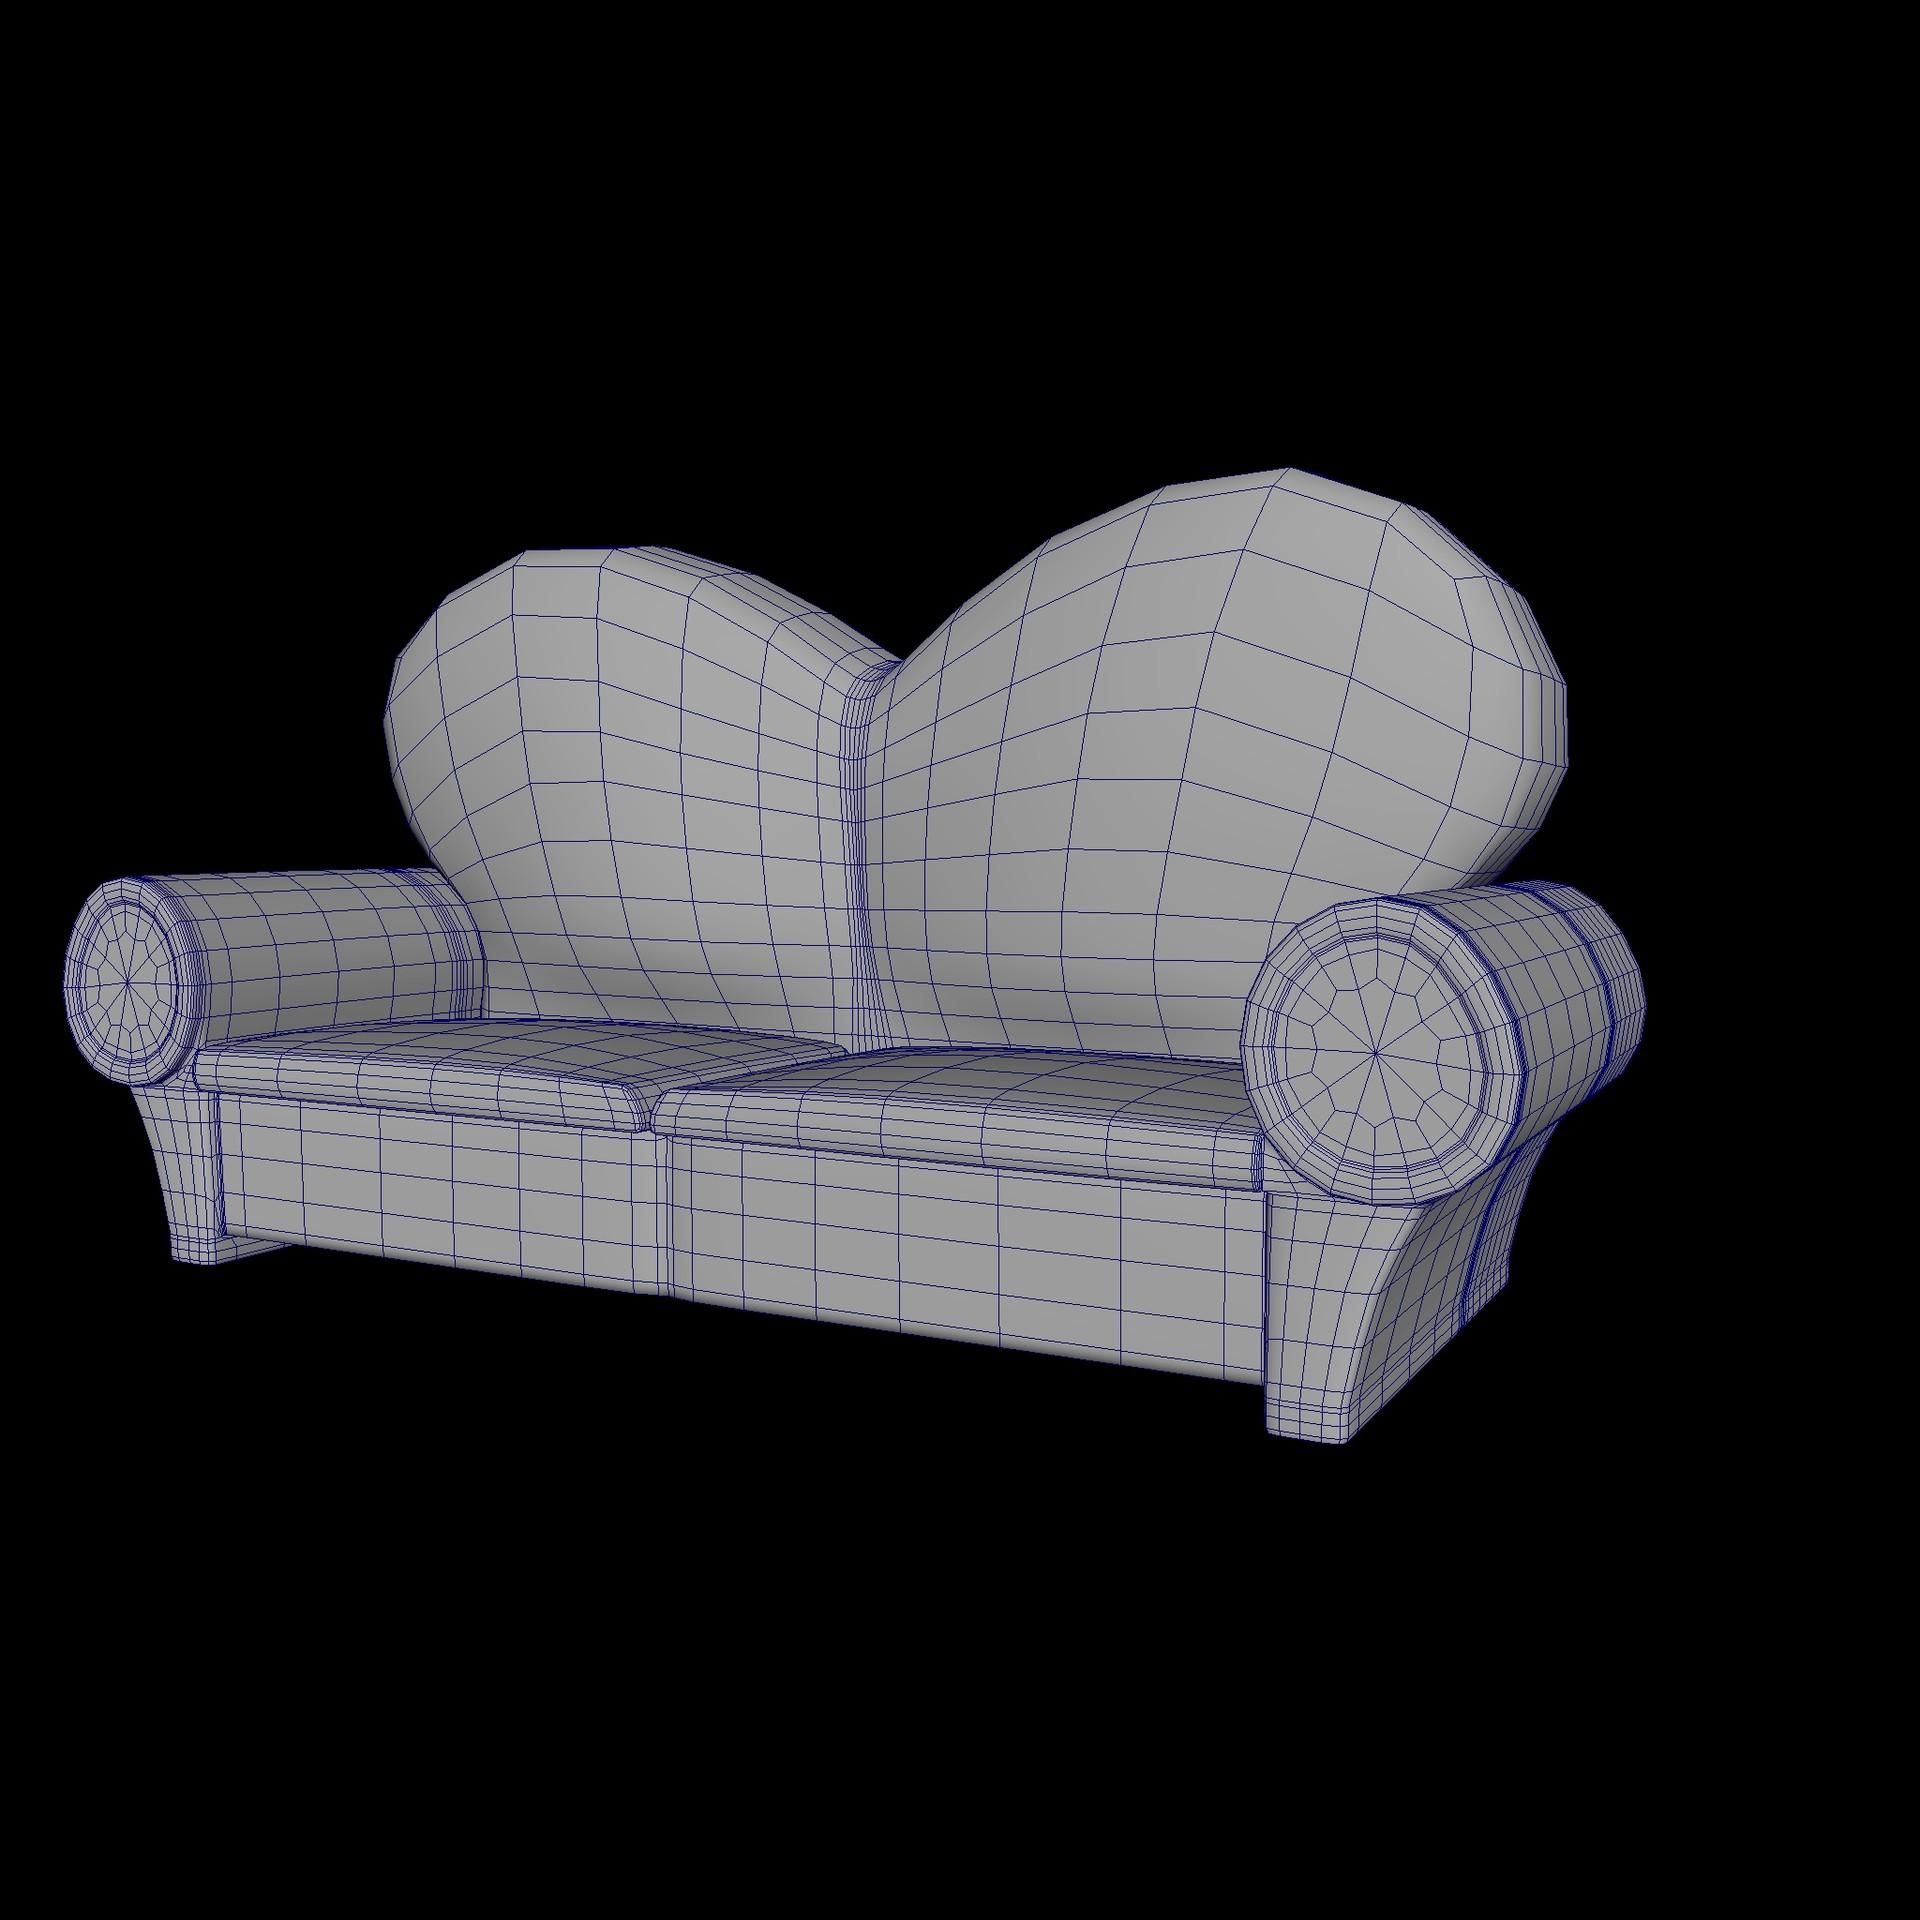 ArtStation - Ratty Couch, Vanessa Rosuello